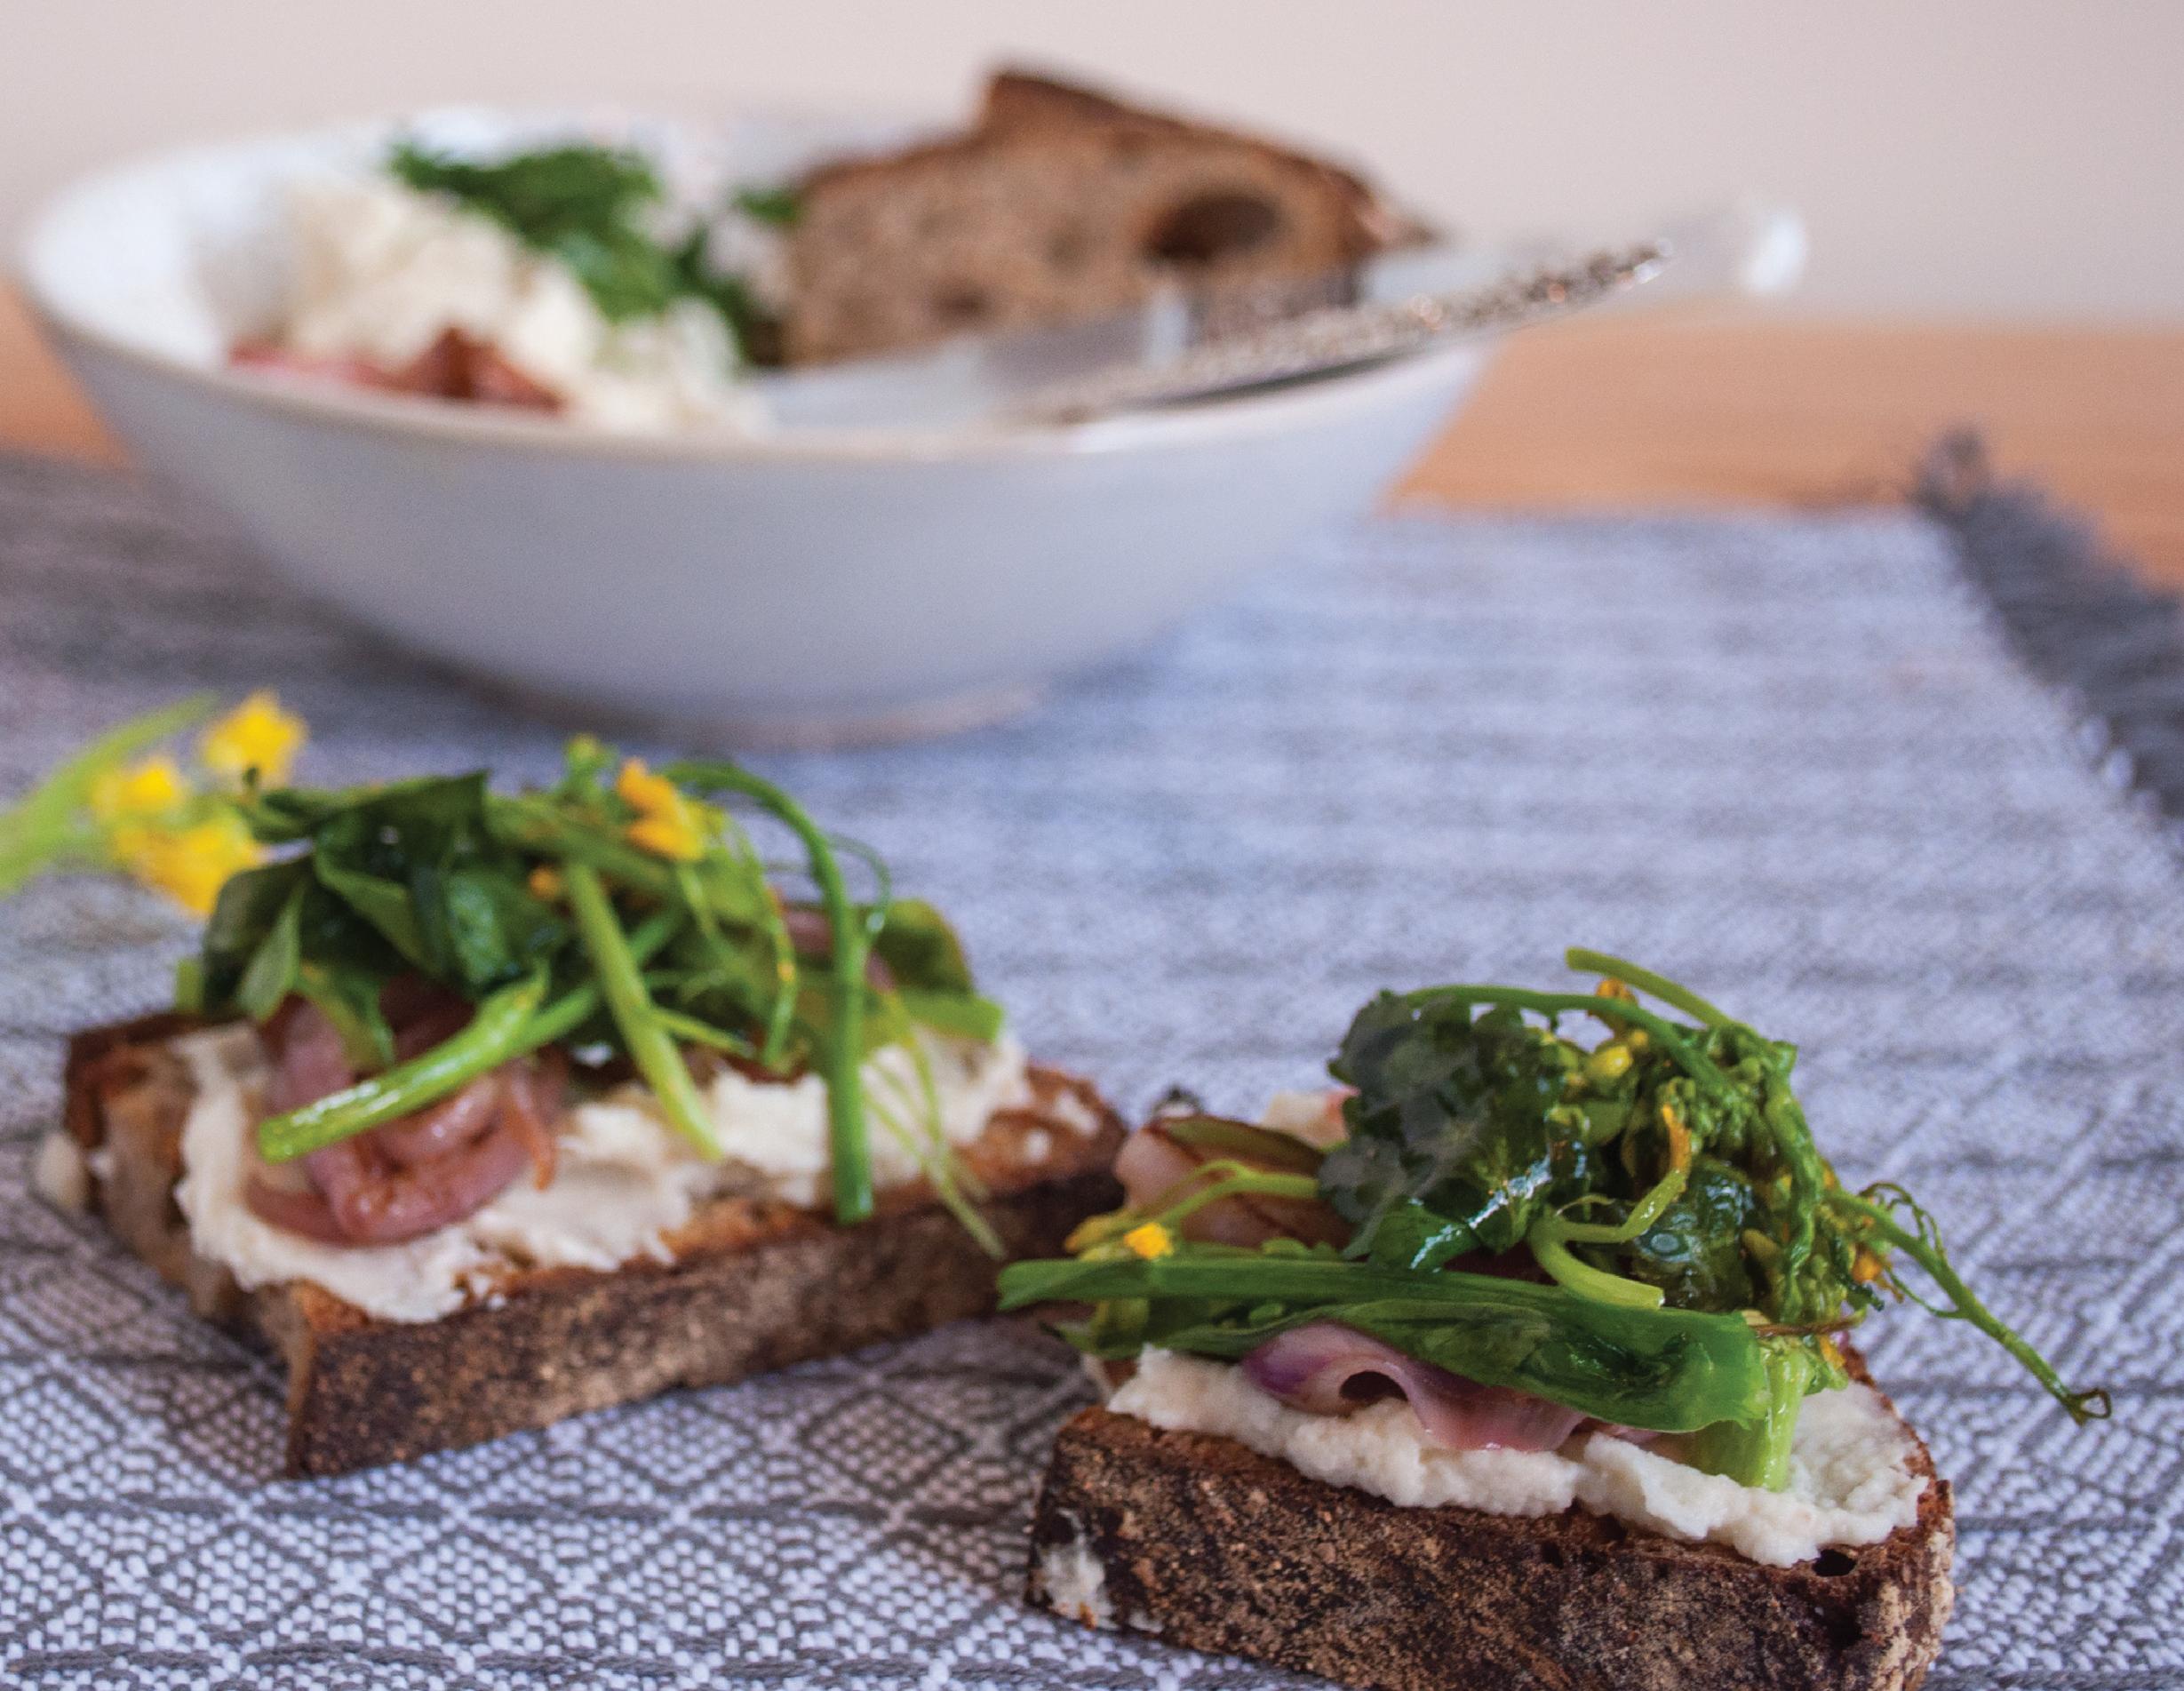 Summerfield Delight | Tartine Toasts with Roasted Cauliflower Hummus and Sautéed Shallots and Rapini